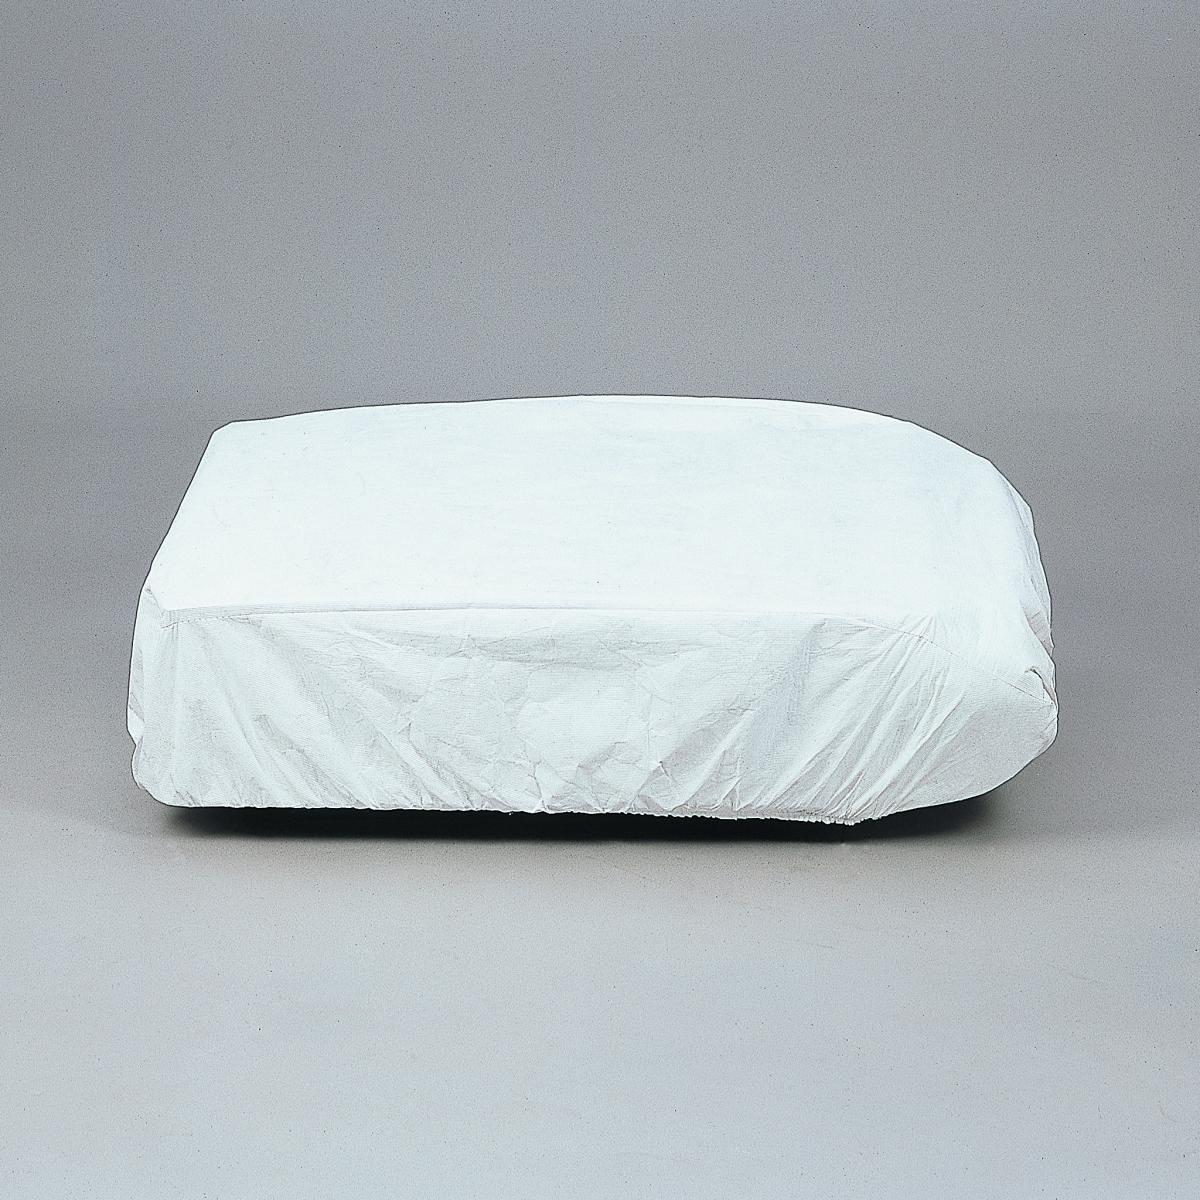 hindermann schutzh lle f r dachklimaanlagen dometic freshjet von hindermann bei campingshop. Black Bedroom Furniture Sets. Home Design Ideas